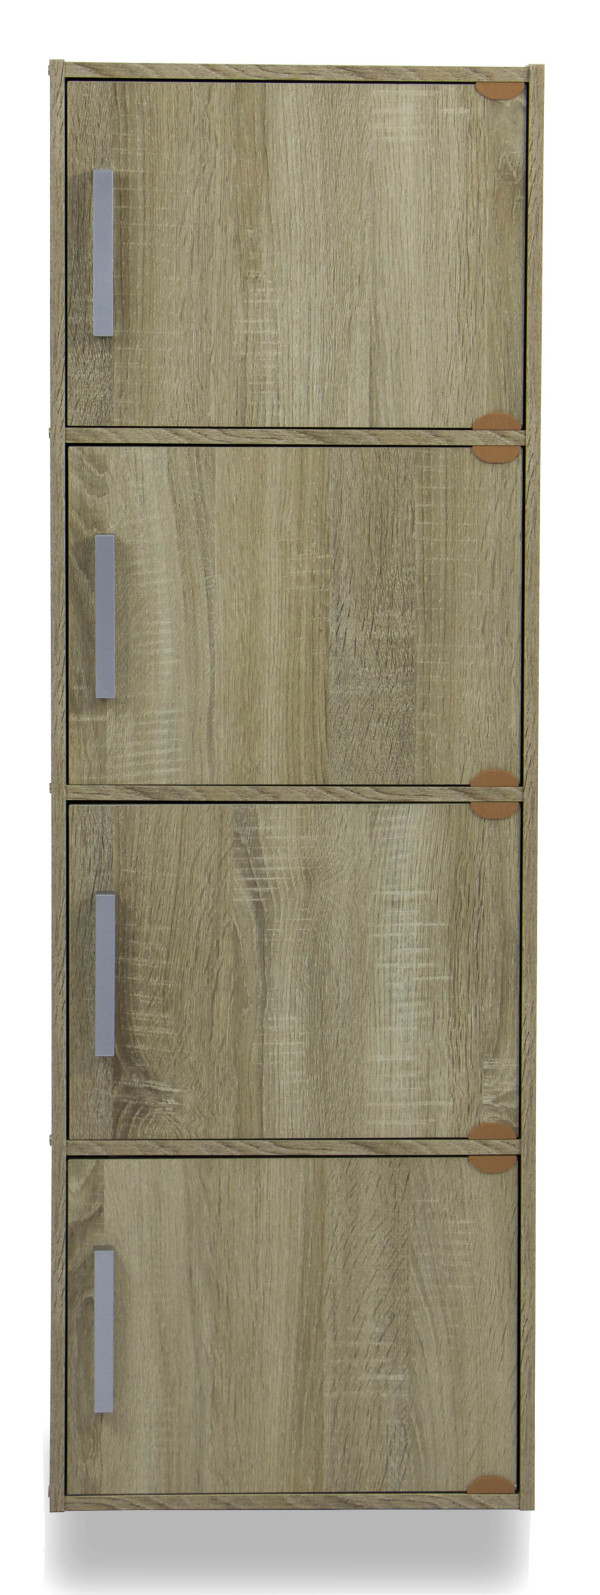 Axel Storage Cabinet in Sonoma Oak